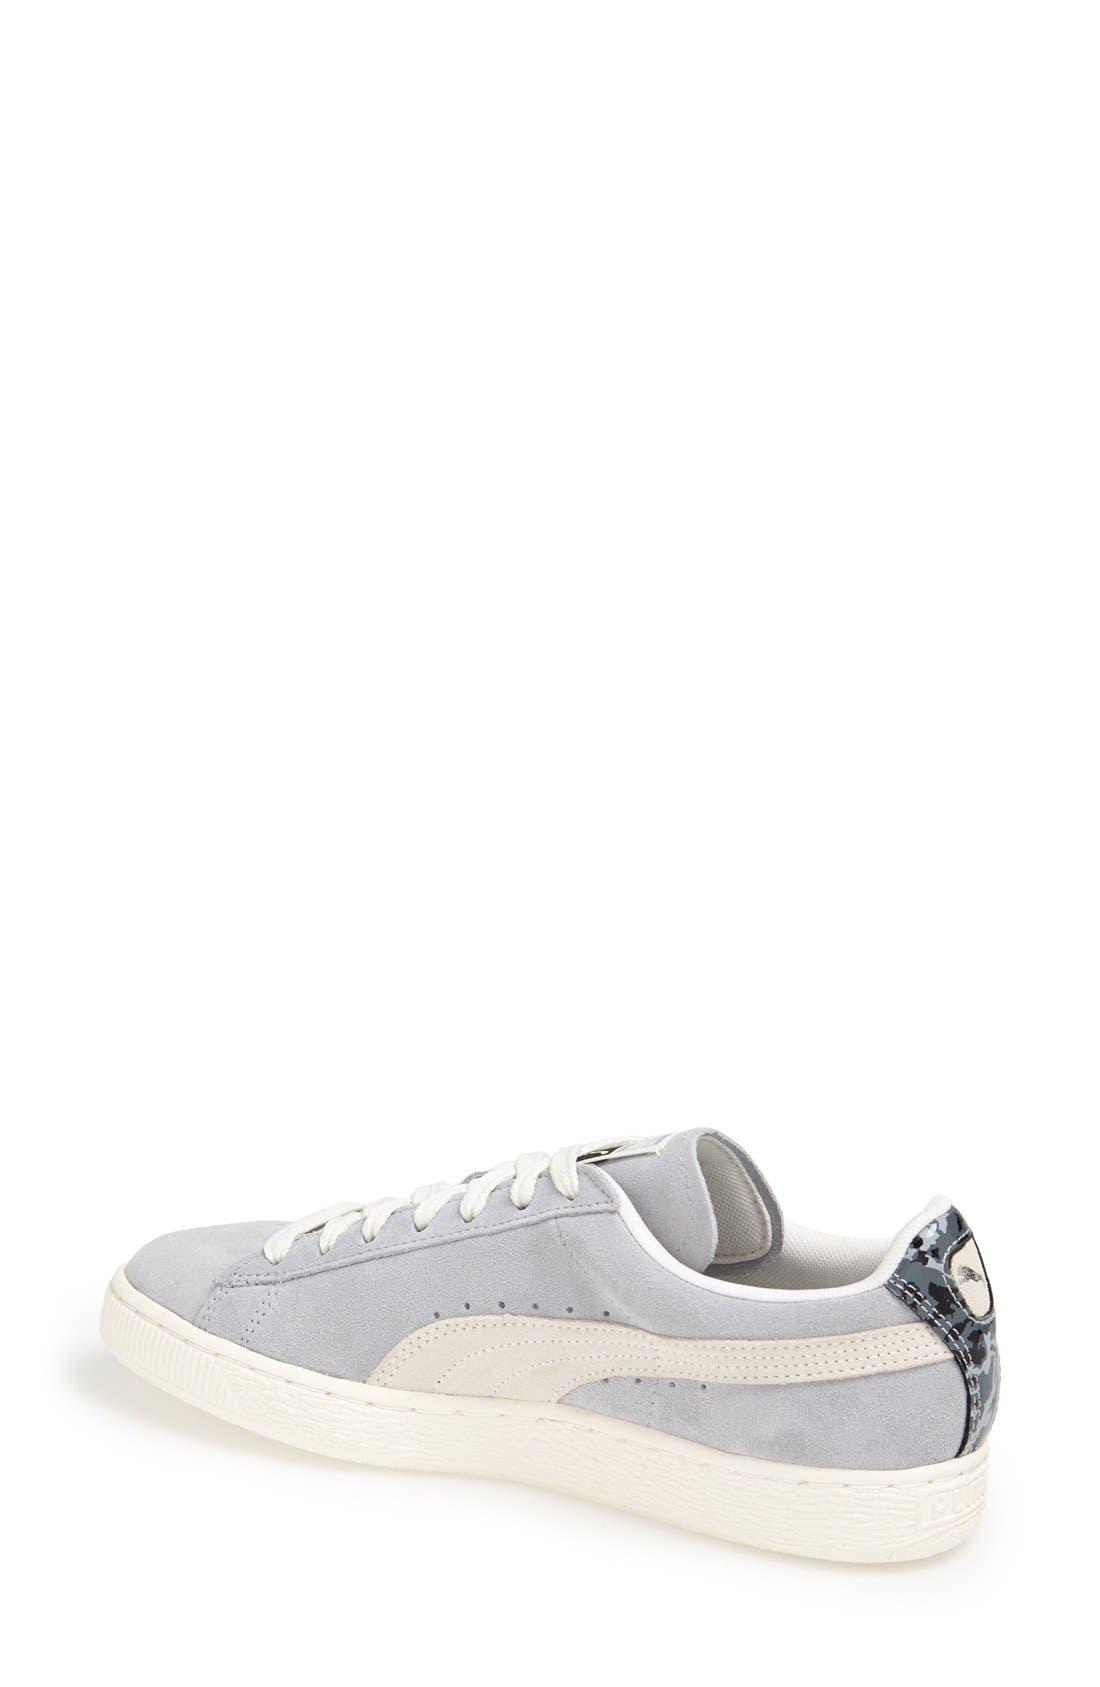 Alternate Image 2  - PUMA 'Classic' Suede Sneaker (Women)